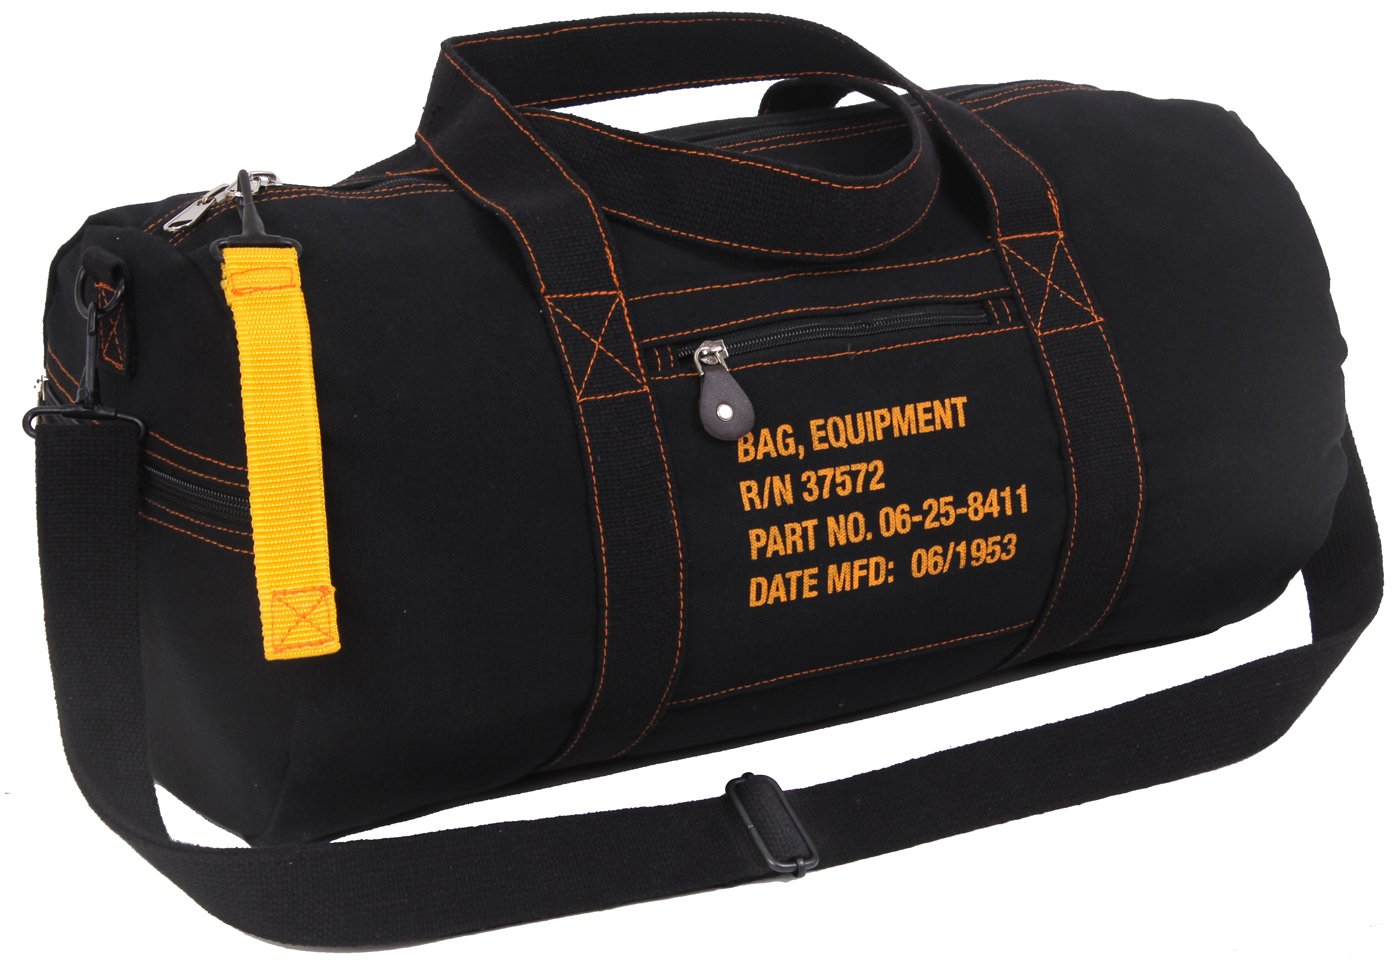 Rothco Canvas Equipment Bag, Black